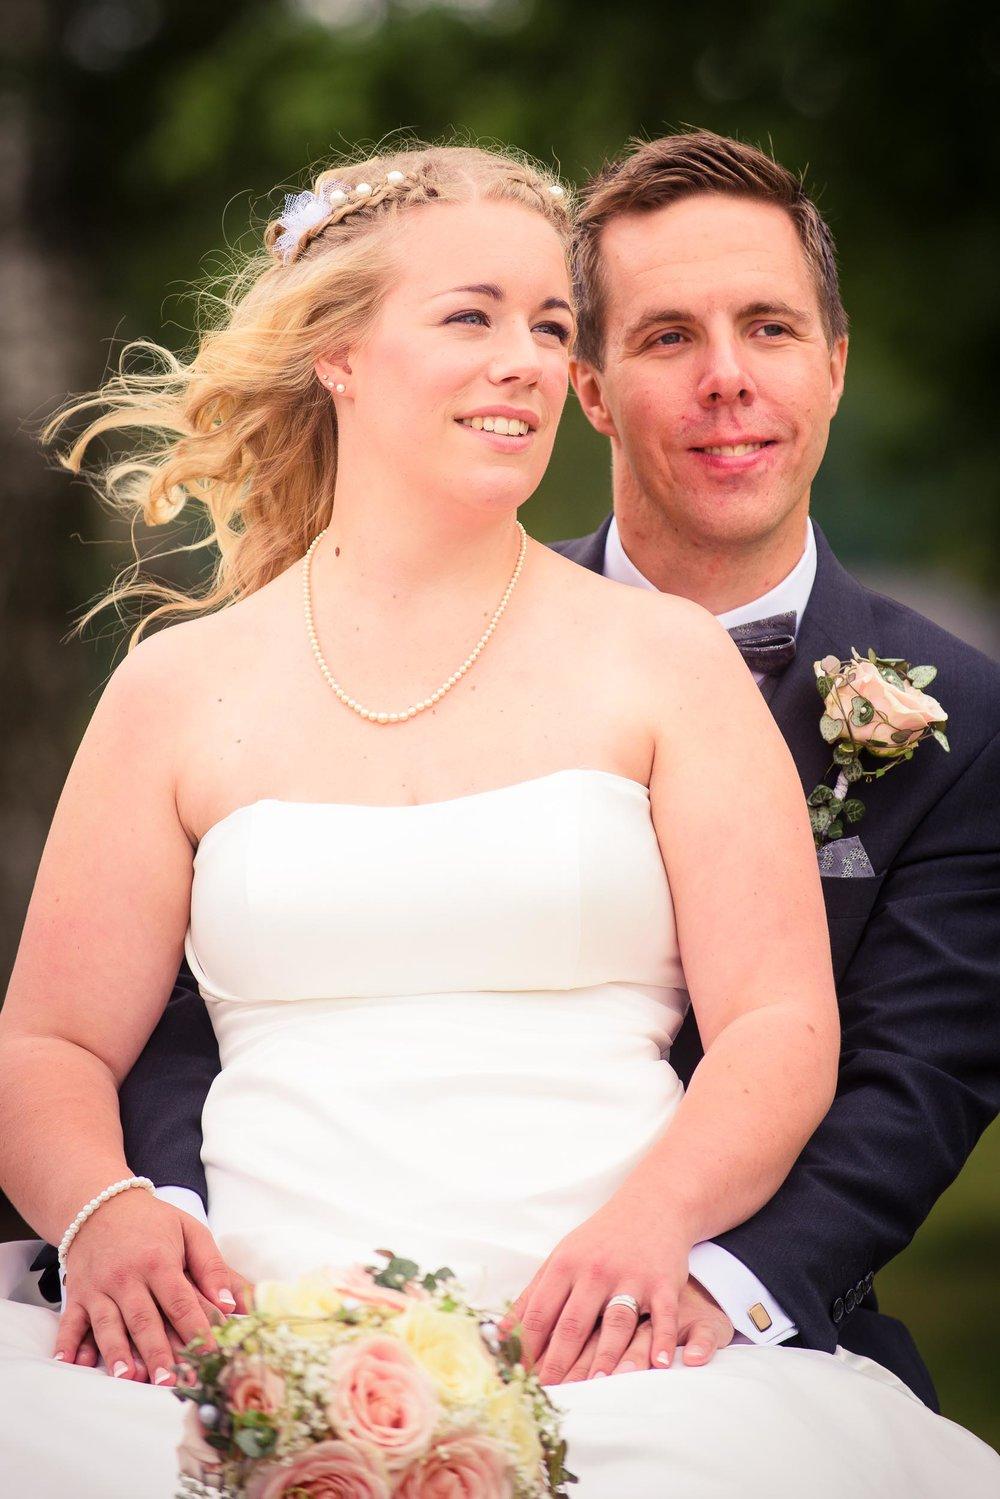 bröllopsfoto-tyringe-aug17-6.jpg